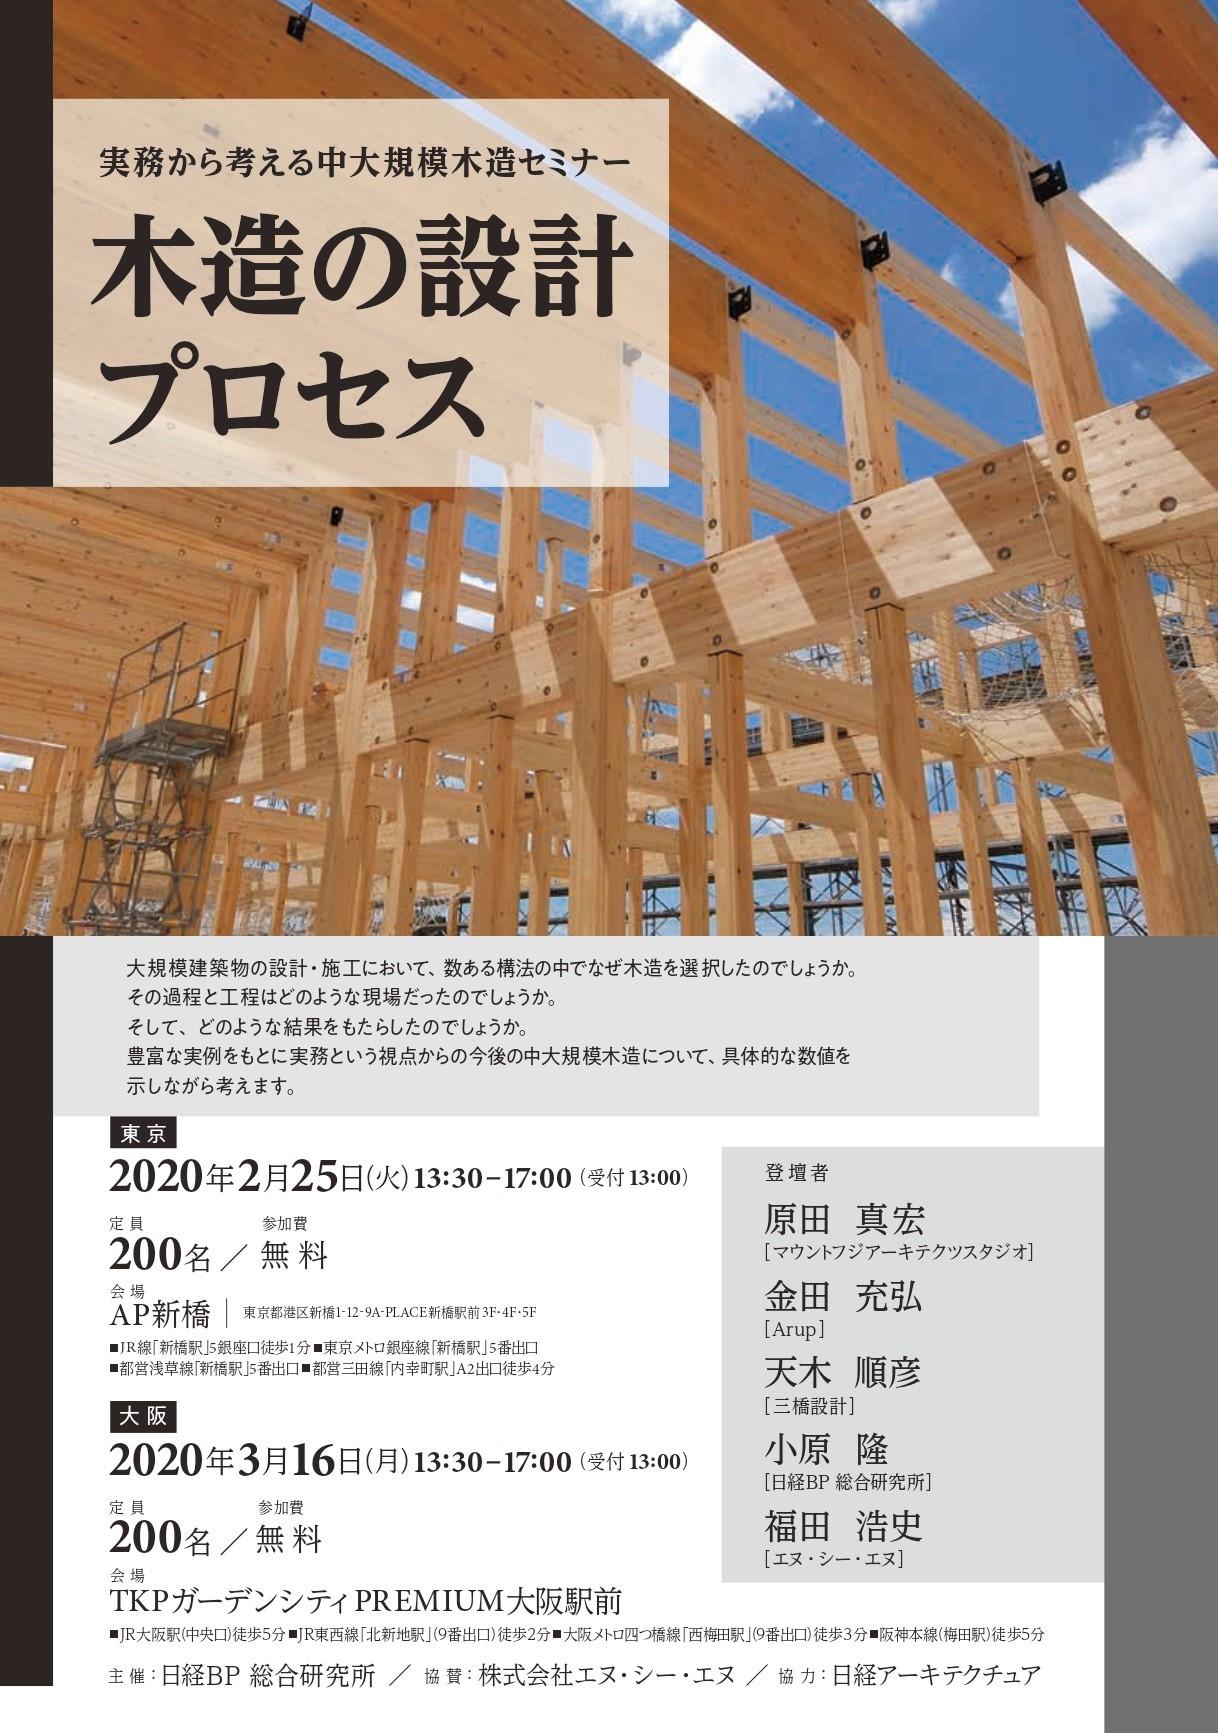 SE構法 中大規模木造建築 セミナー